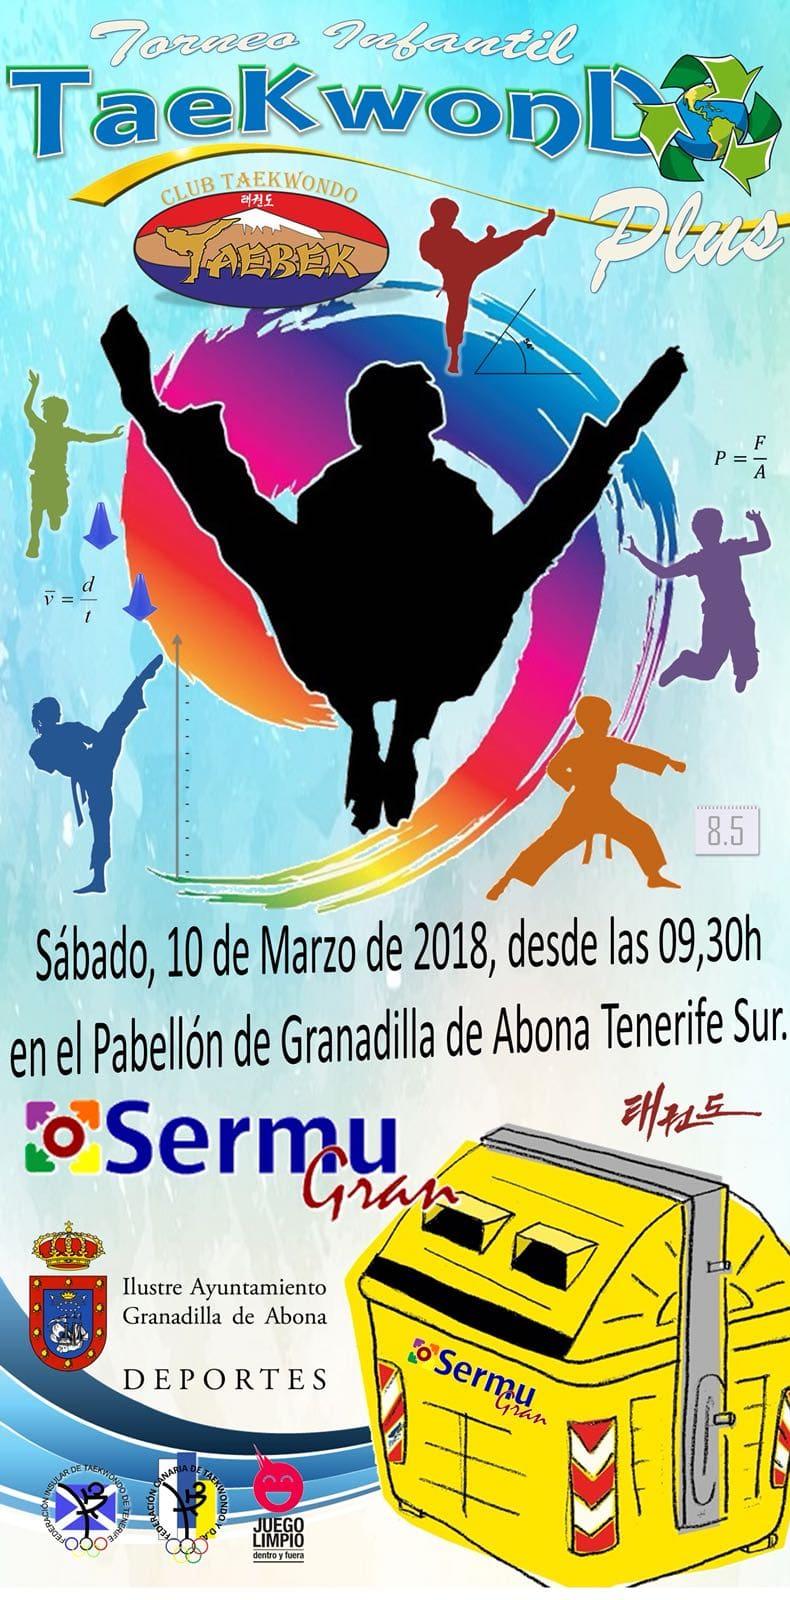 El Torneo Infantil 'Taekwondo Plus Sermugran', este sábado en el Pabellón Municipal de Deportes